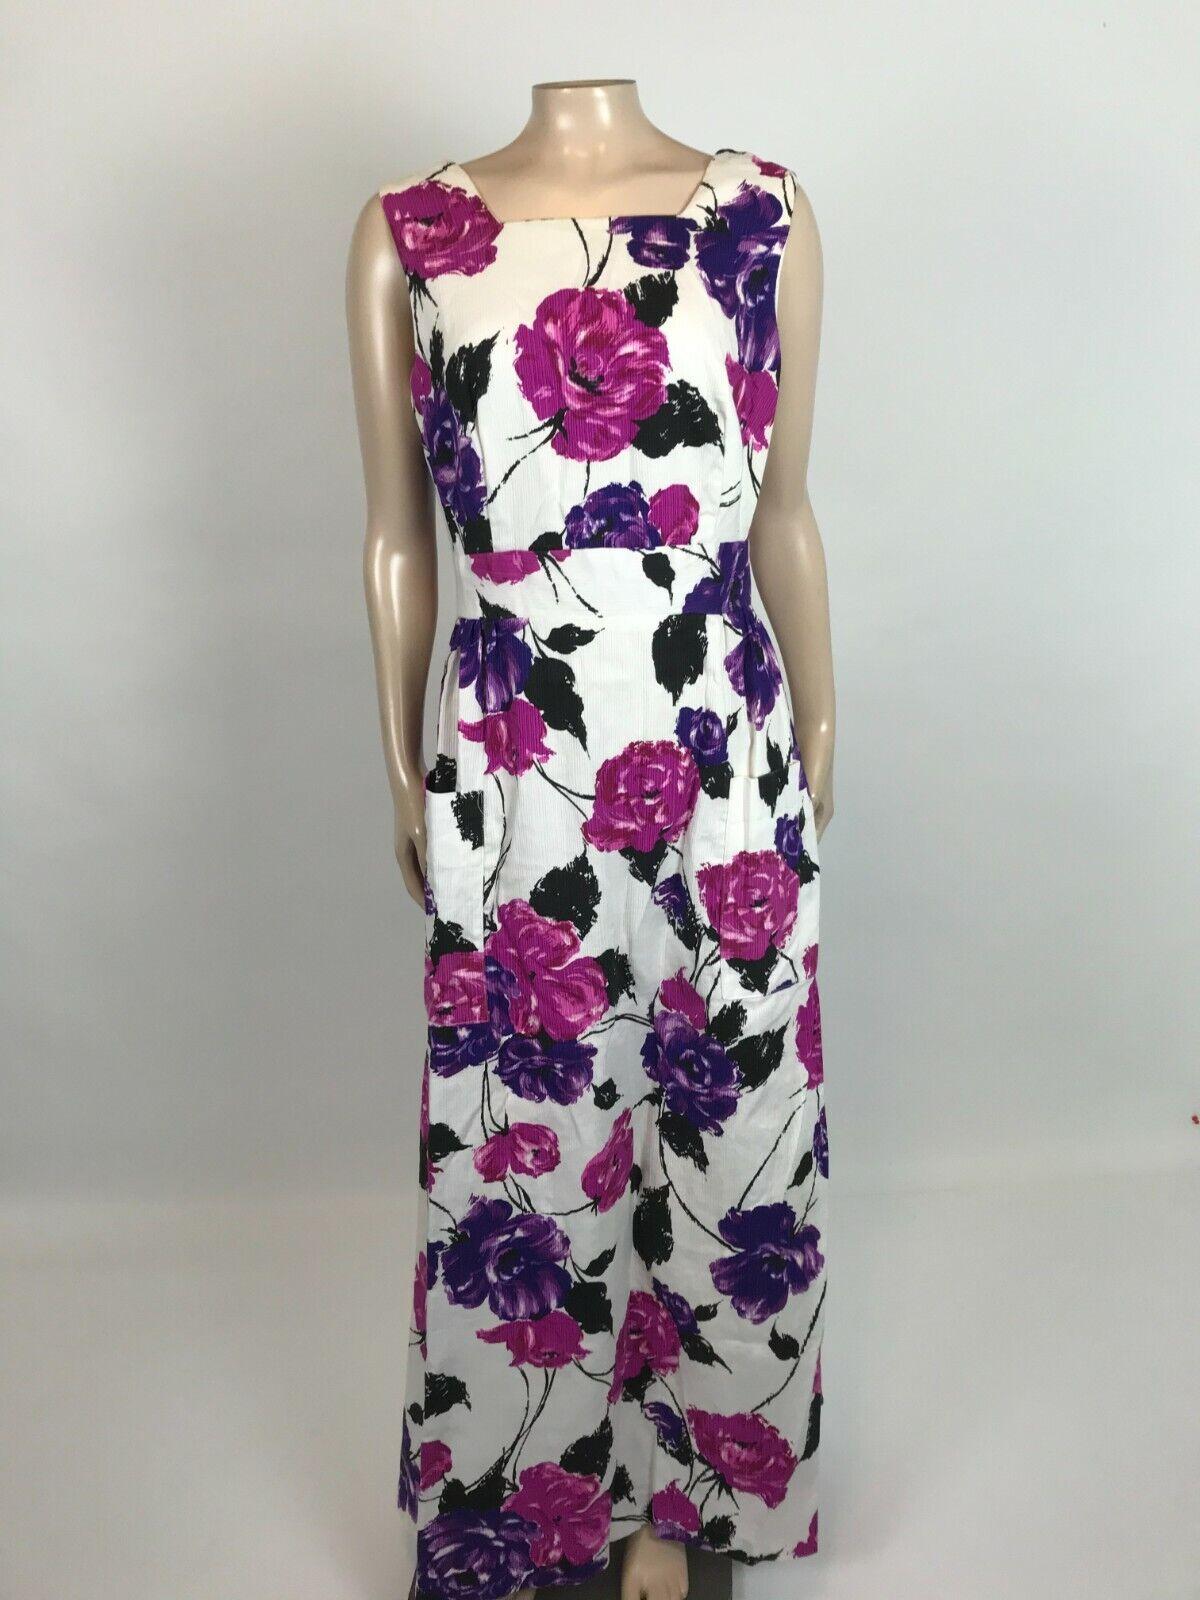 Vintage 70's Montgomery ward Women's Dress Party Maxi POCKETS Floral Purple ZZ8